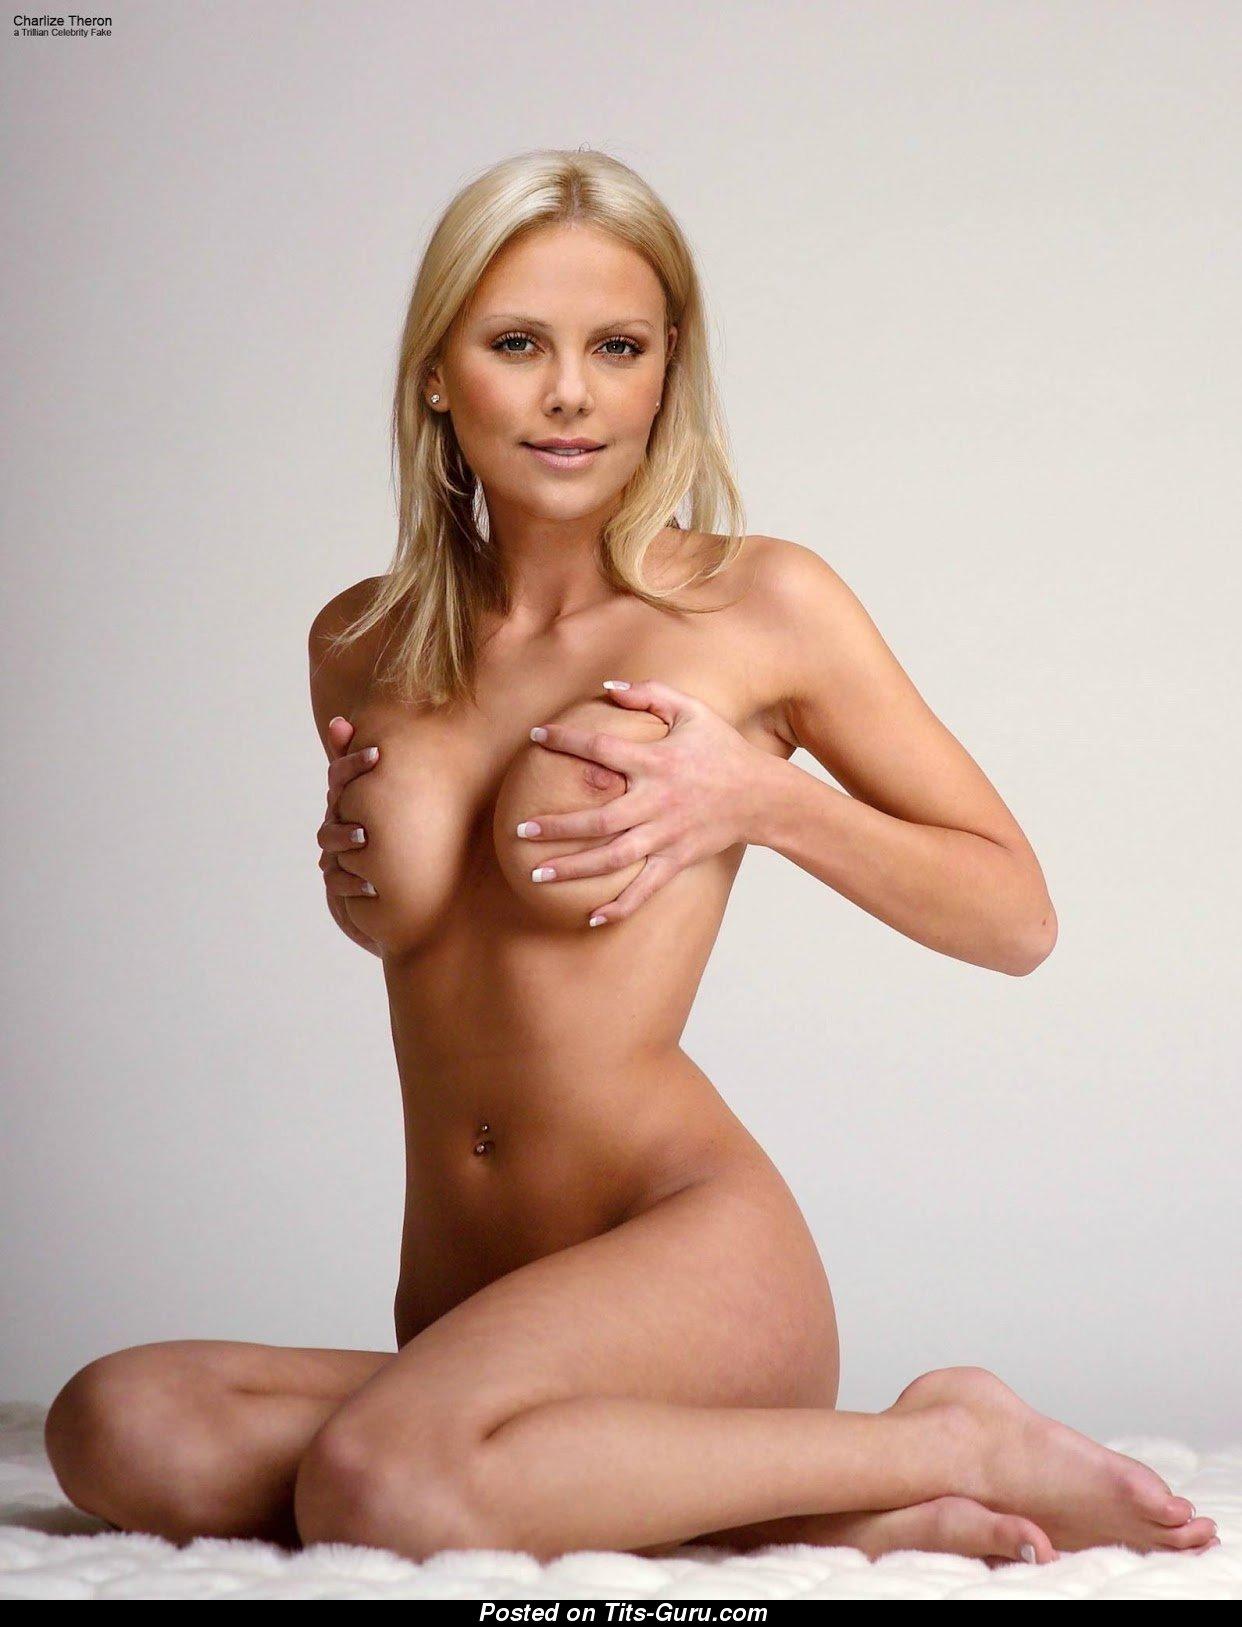 Gretchen carlson nude fake